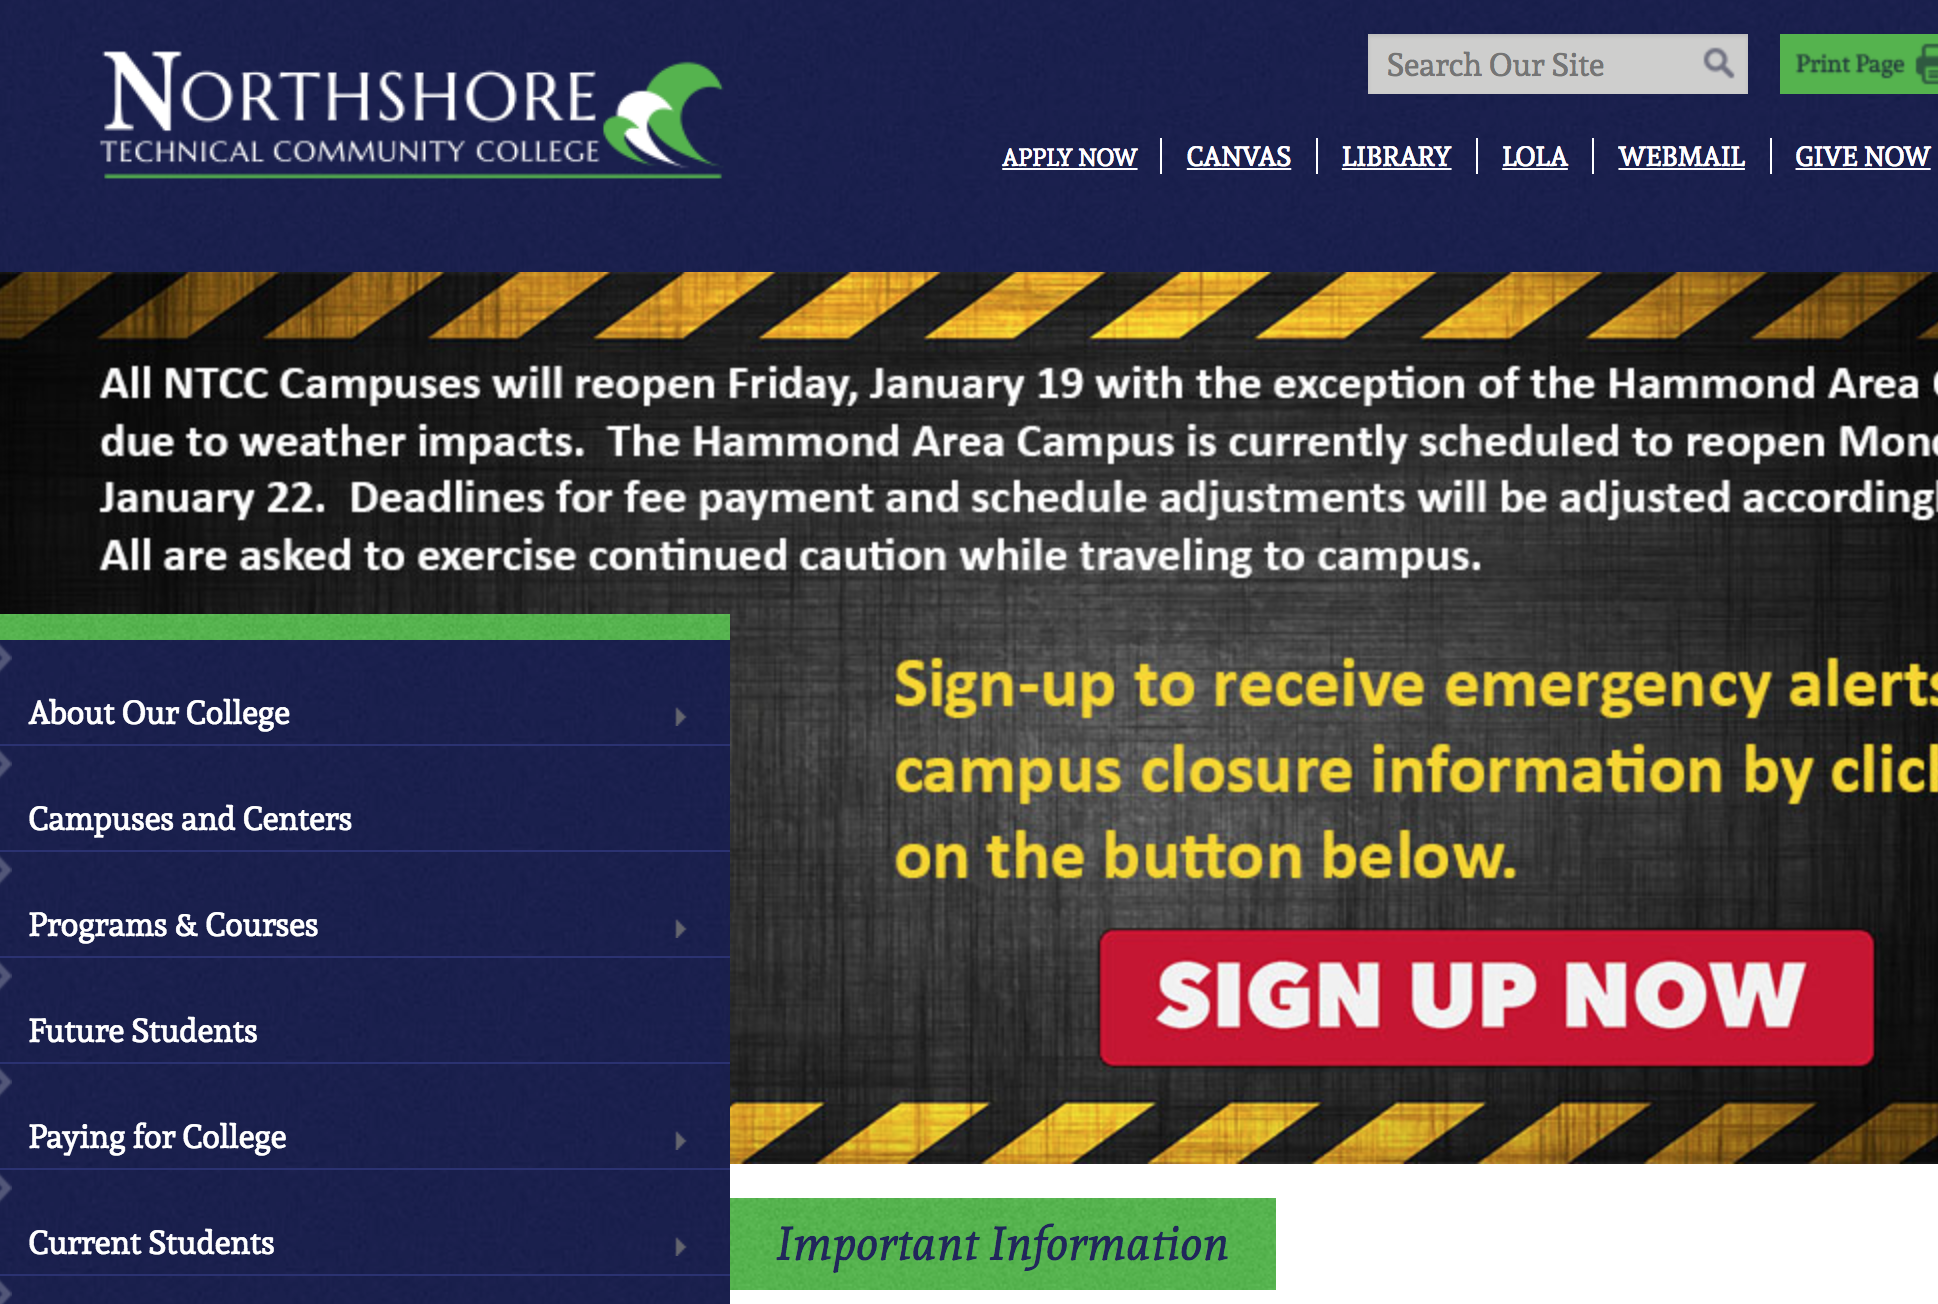 Northshore Technical Community College